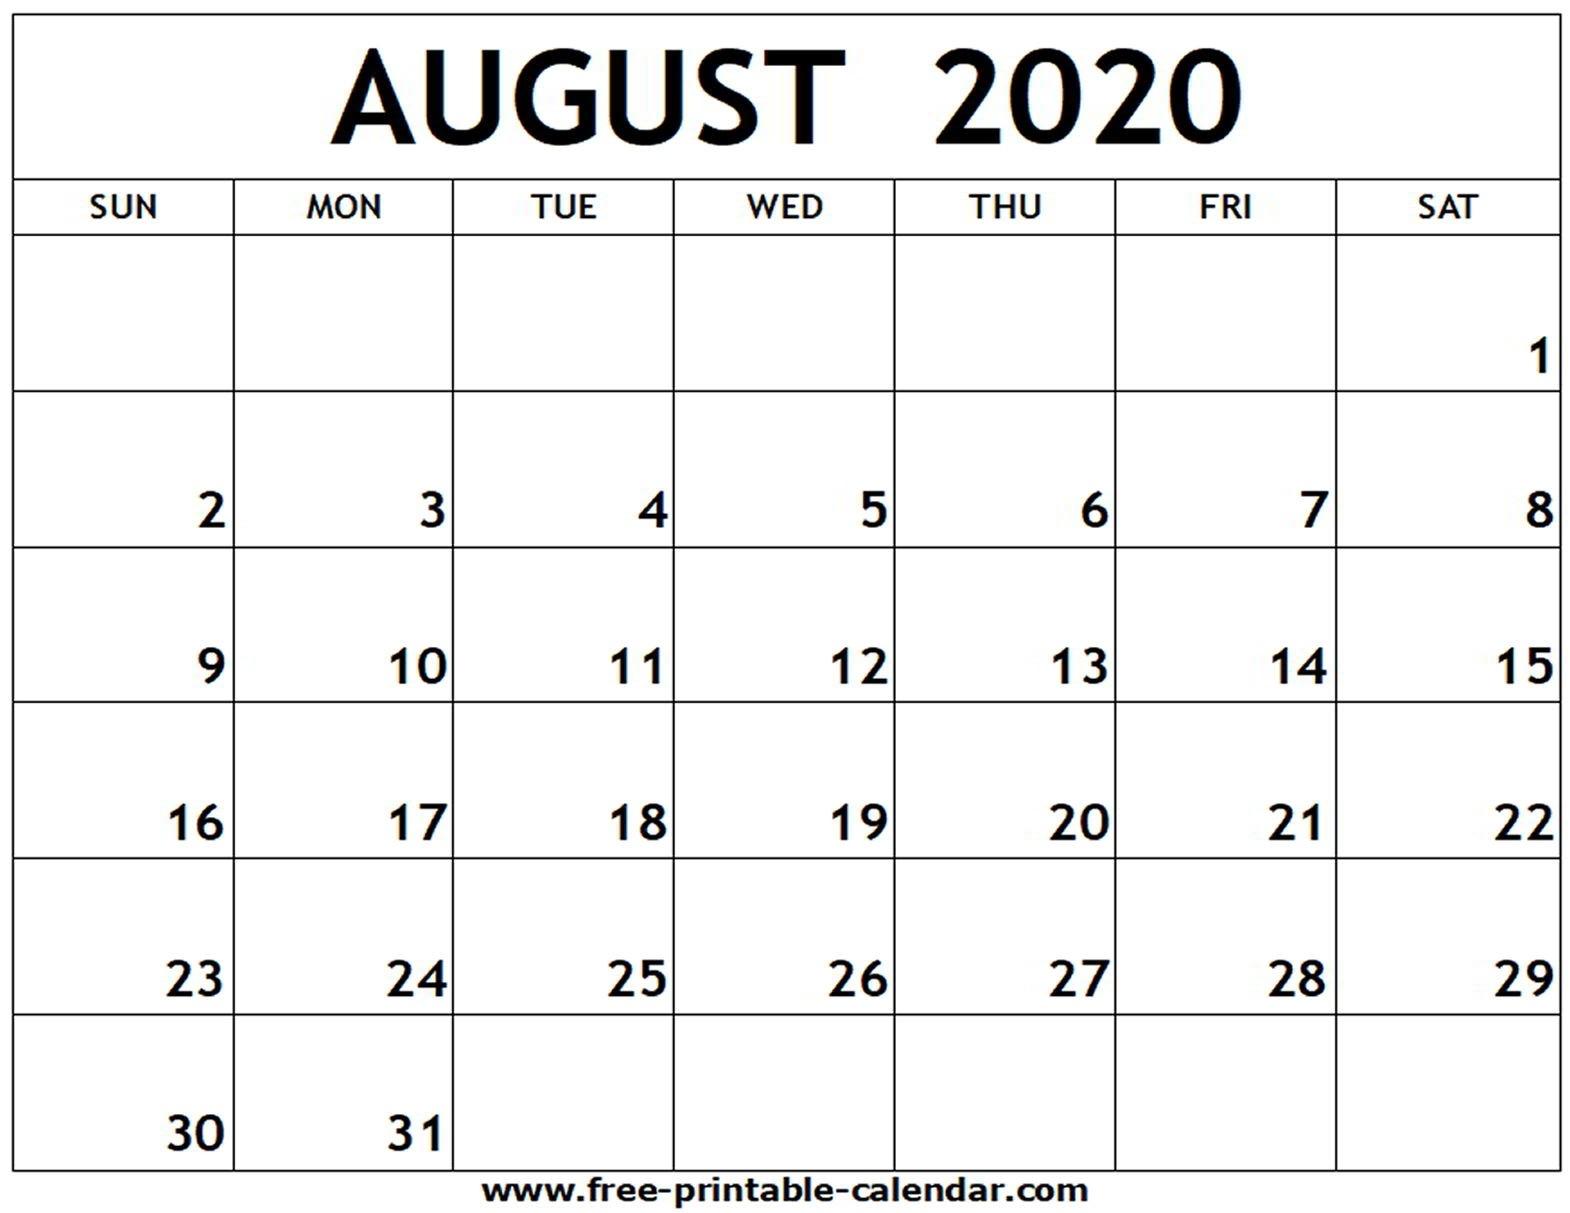 August 2020 Printable Calendar - Free-Printable-Calendar  Blank Calendar For August 2020 Printable